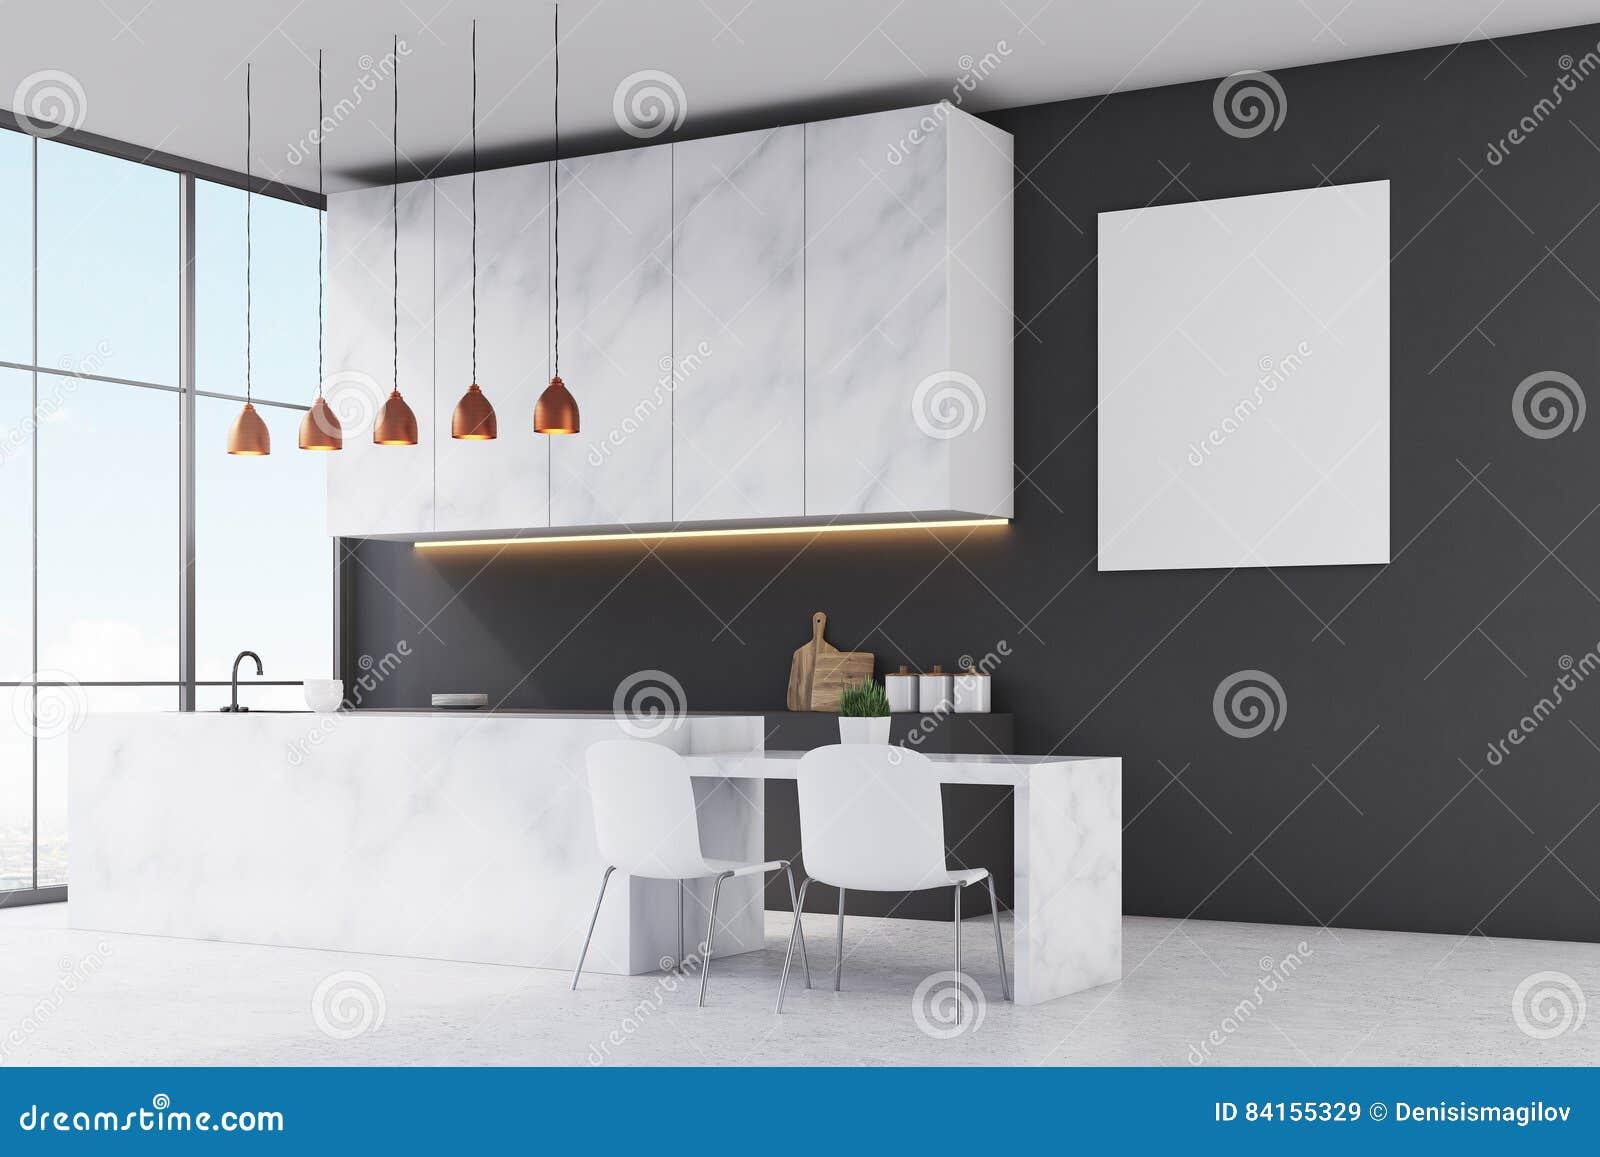 gallery of cucine bianche e nero moderne cucina componibile urban sito cucina bianca with cucine ...